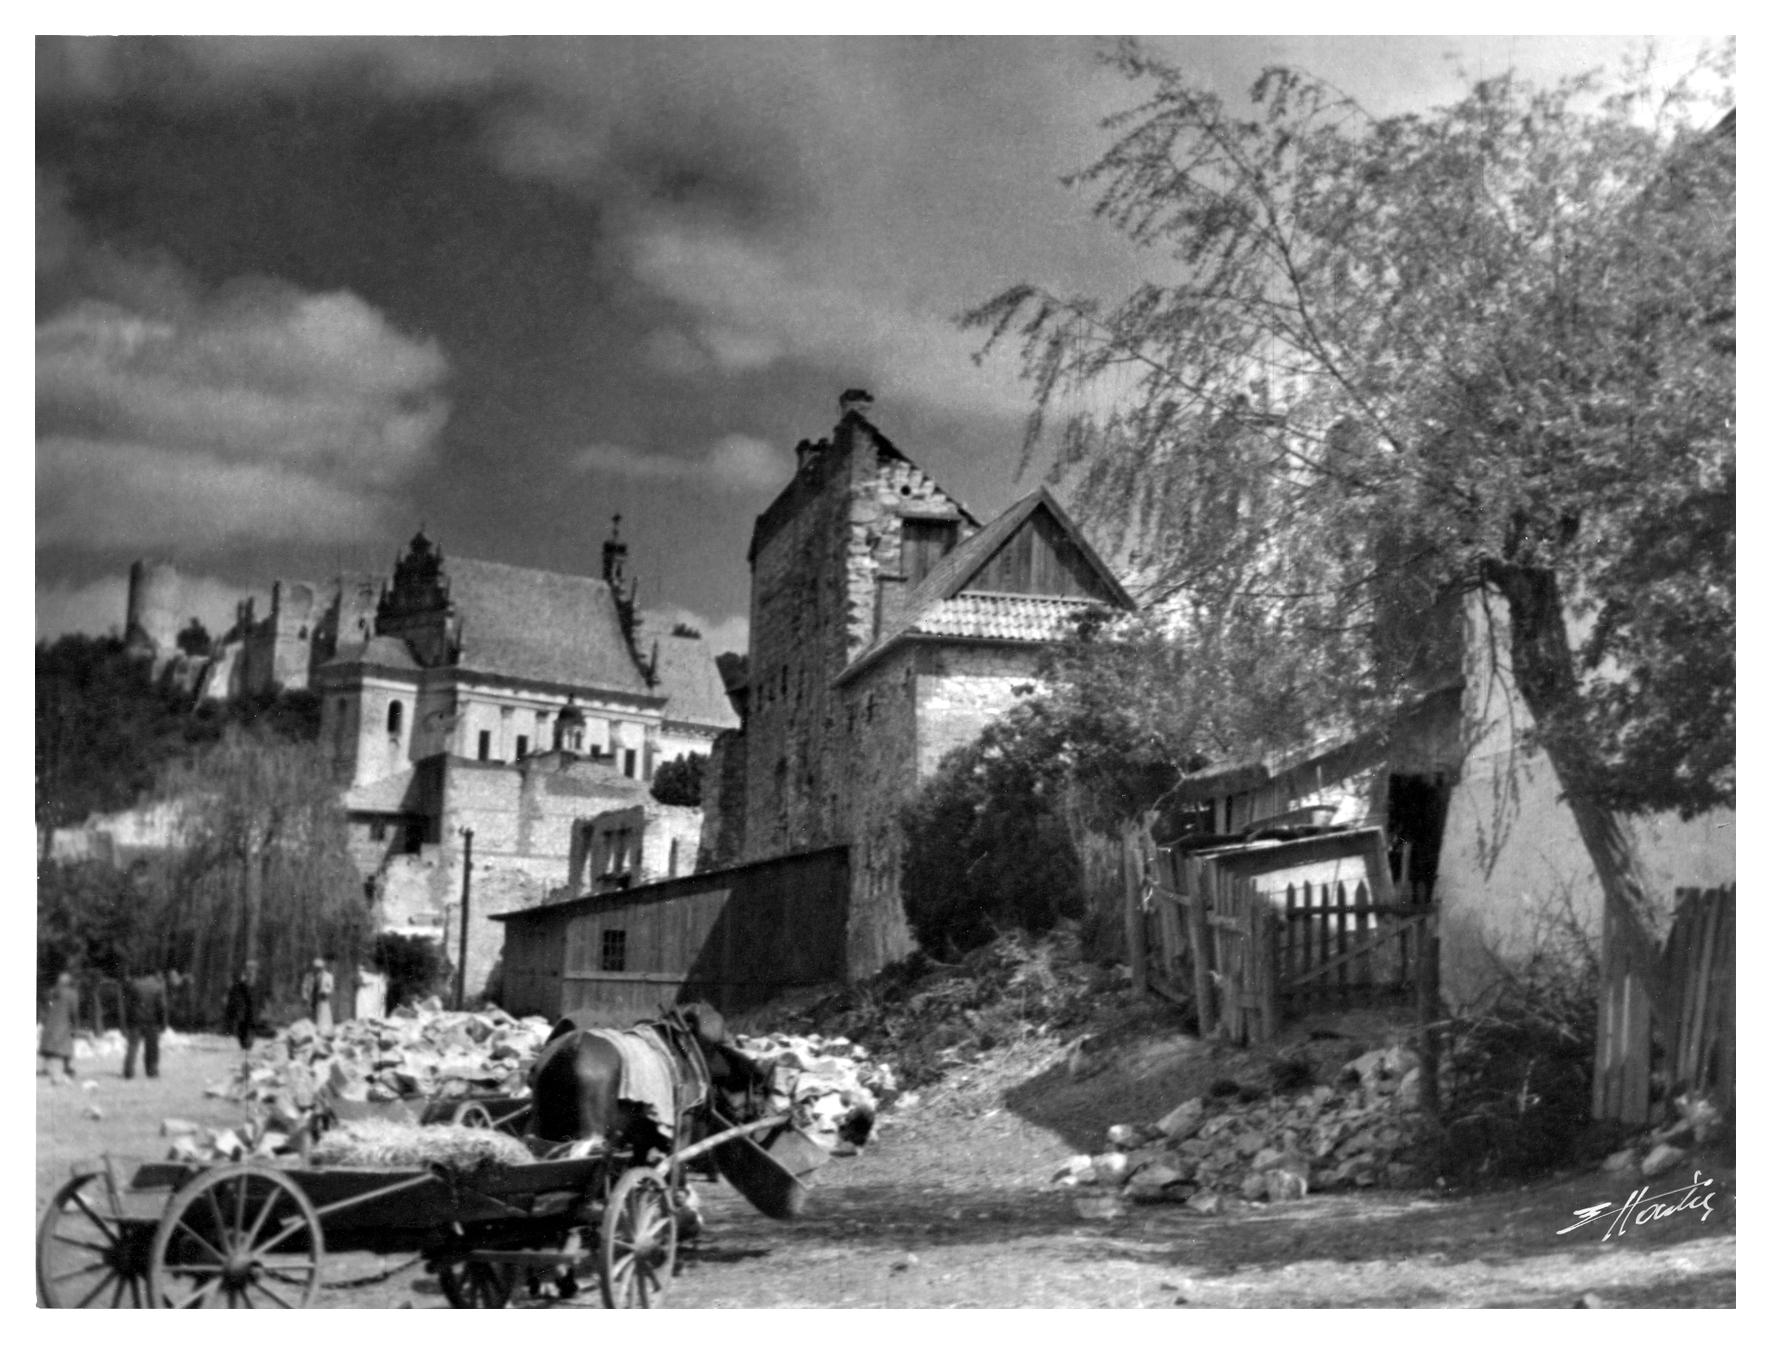 E. Hartwig, Panorama z furmanką, 1935 r.